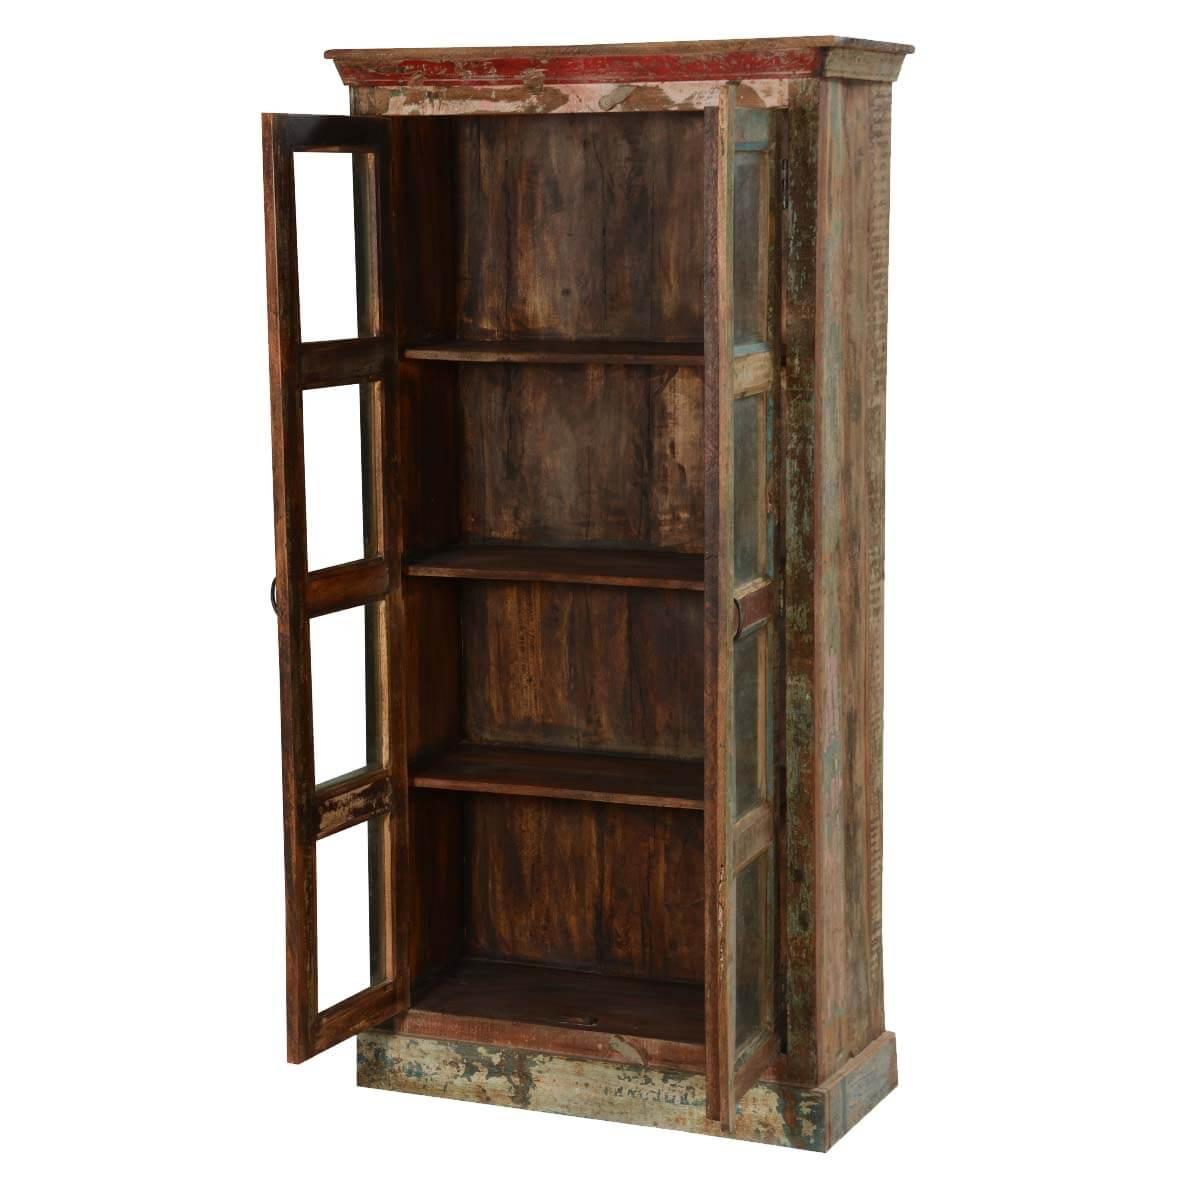 "Rustic Reclaimed Wood New Orleans 71"" High Display Cabinet Armoire - Reclaimed Wood New Orleans 71"" High Display Cabinet Armoire"